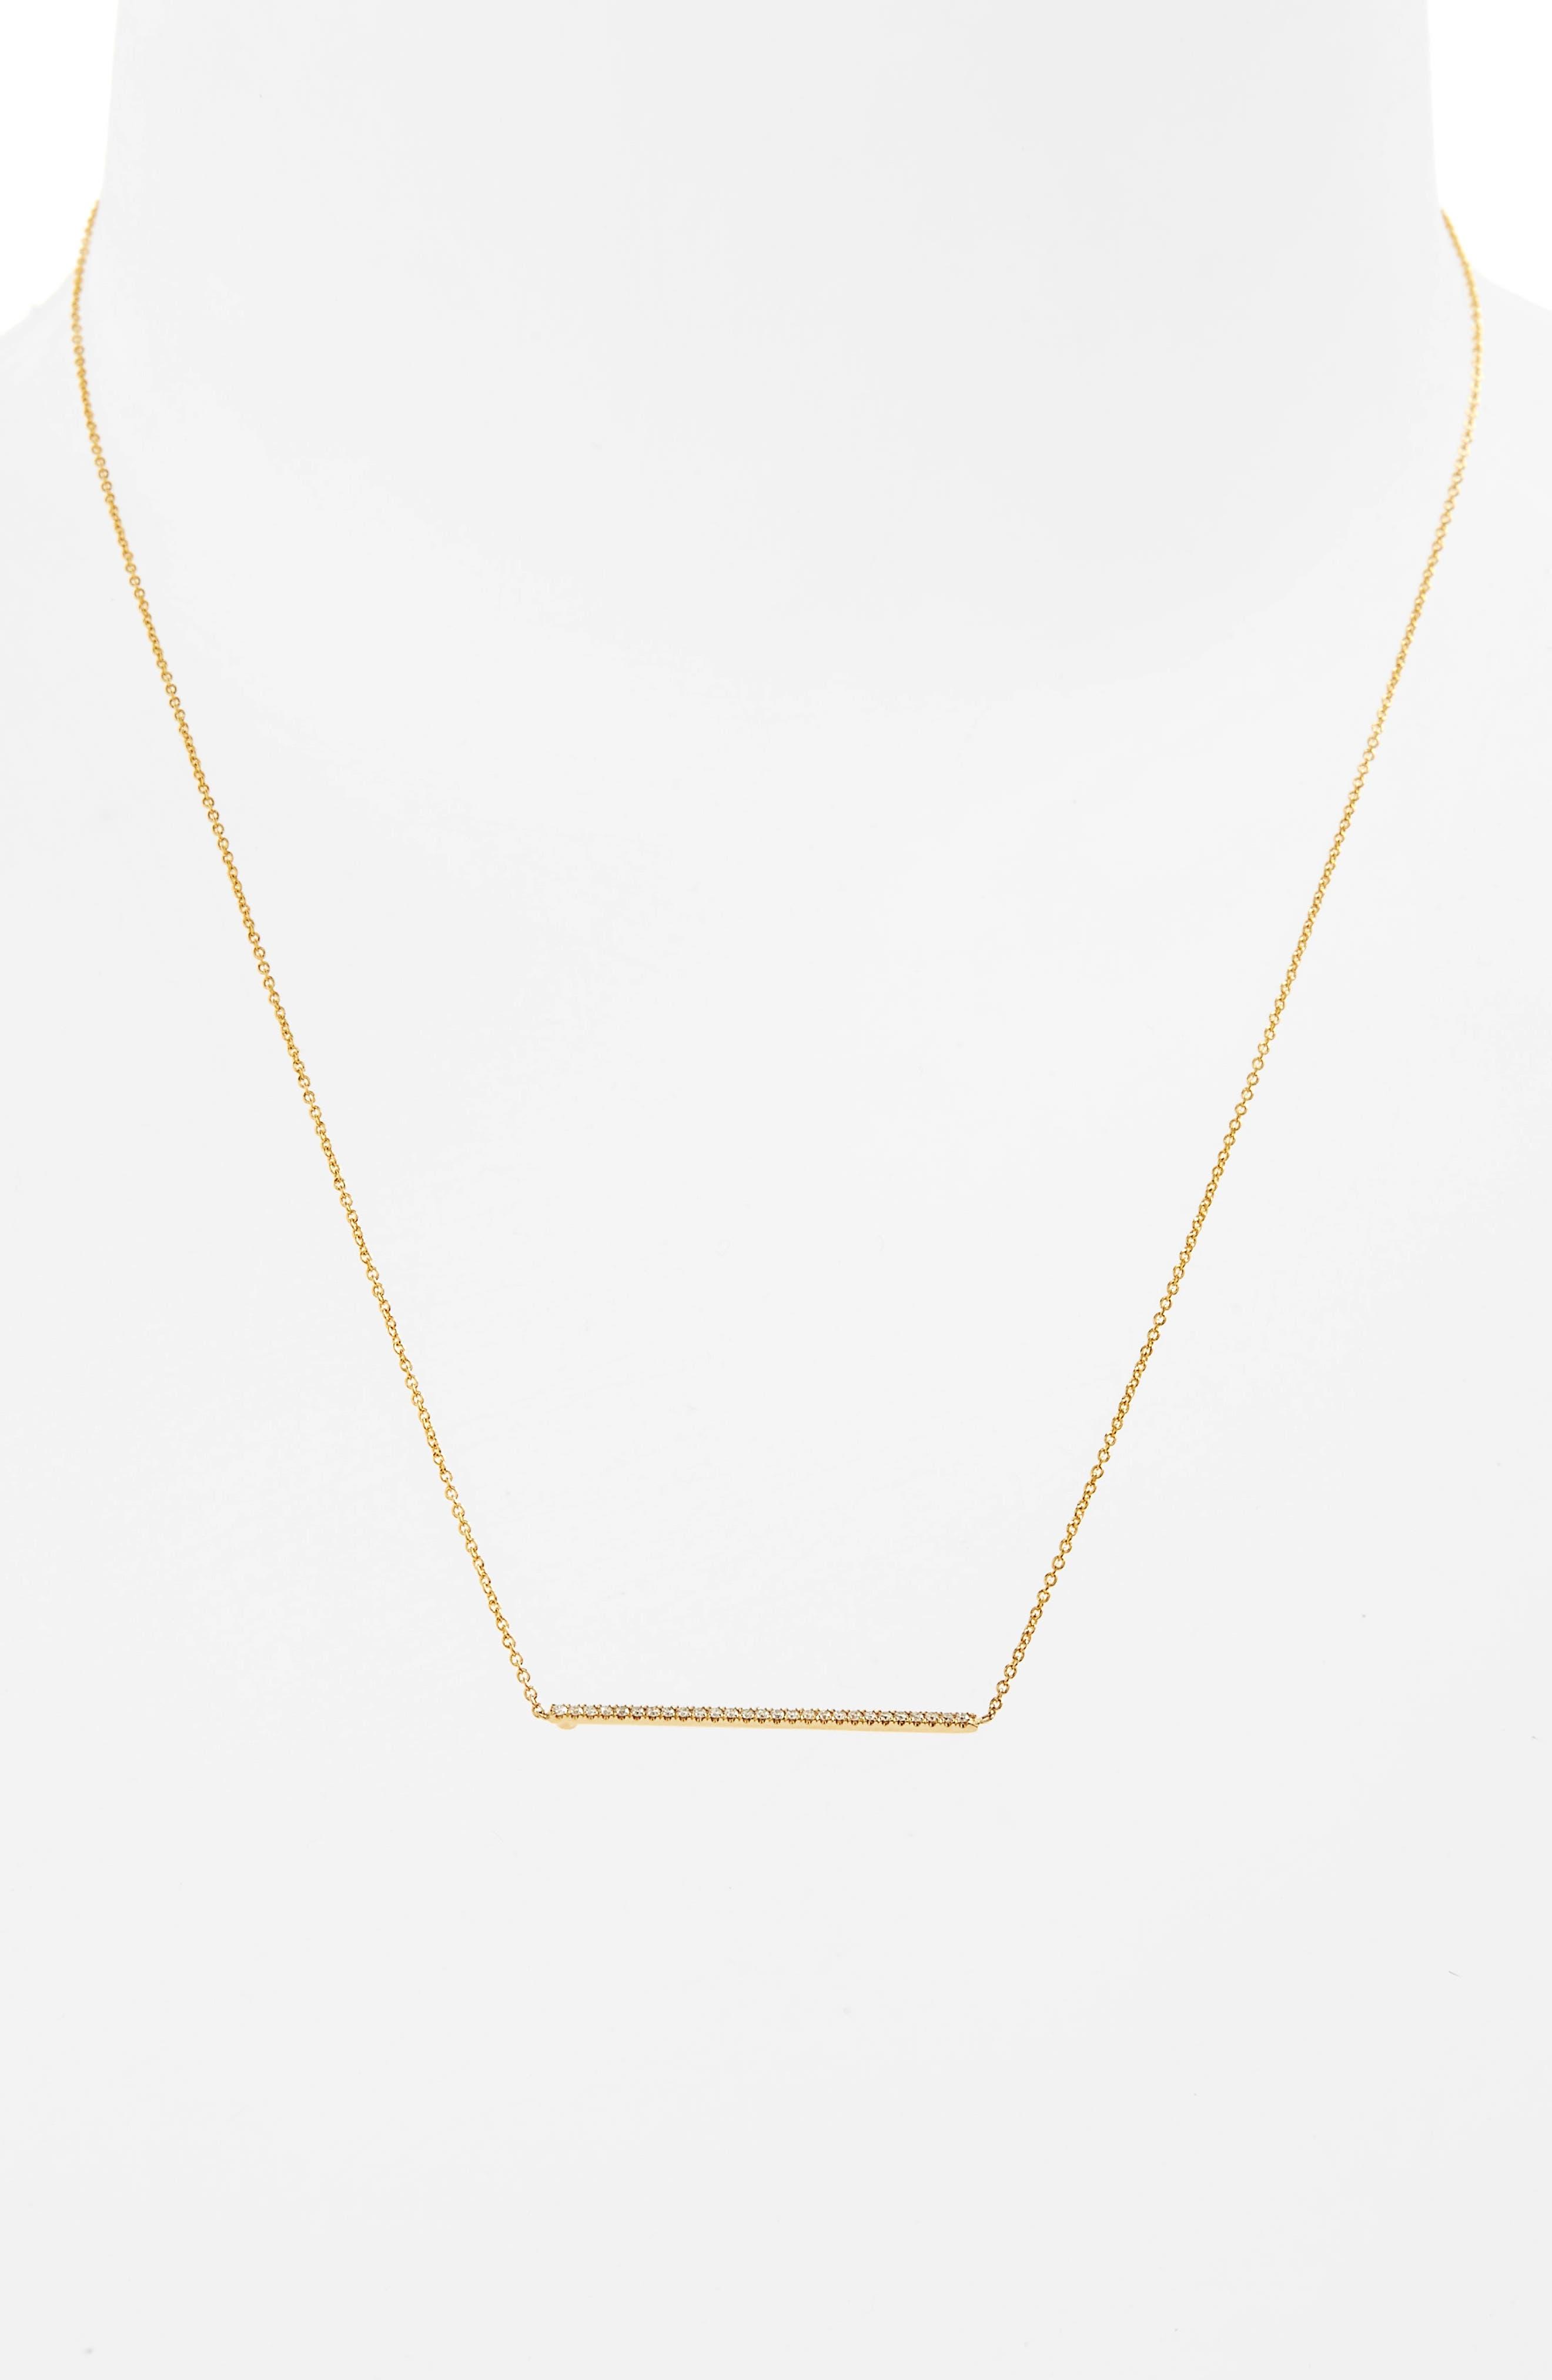 Tiny Treasures Diamond Bar Necklace,                             Alternate thumbnail 3, color,